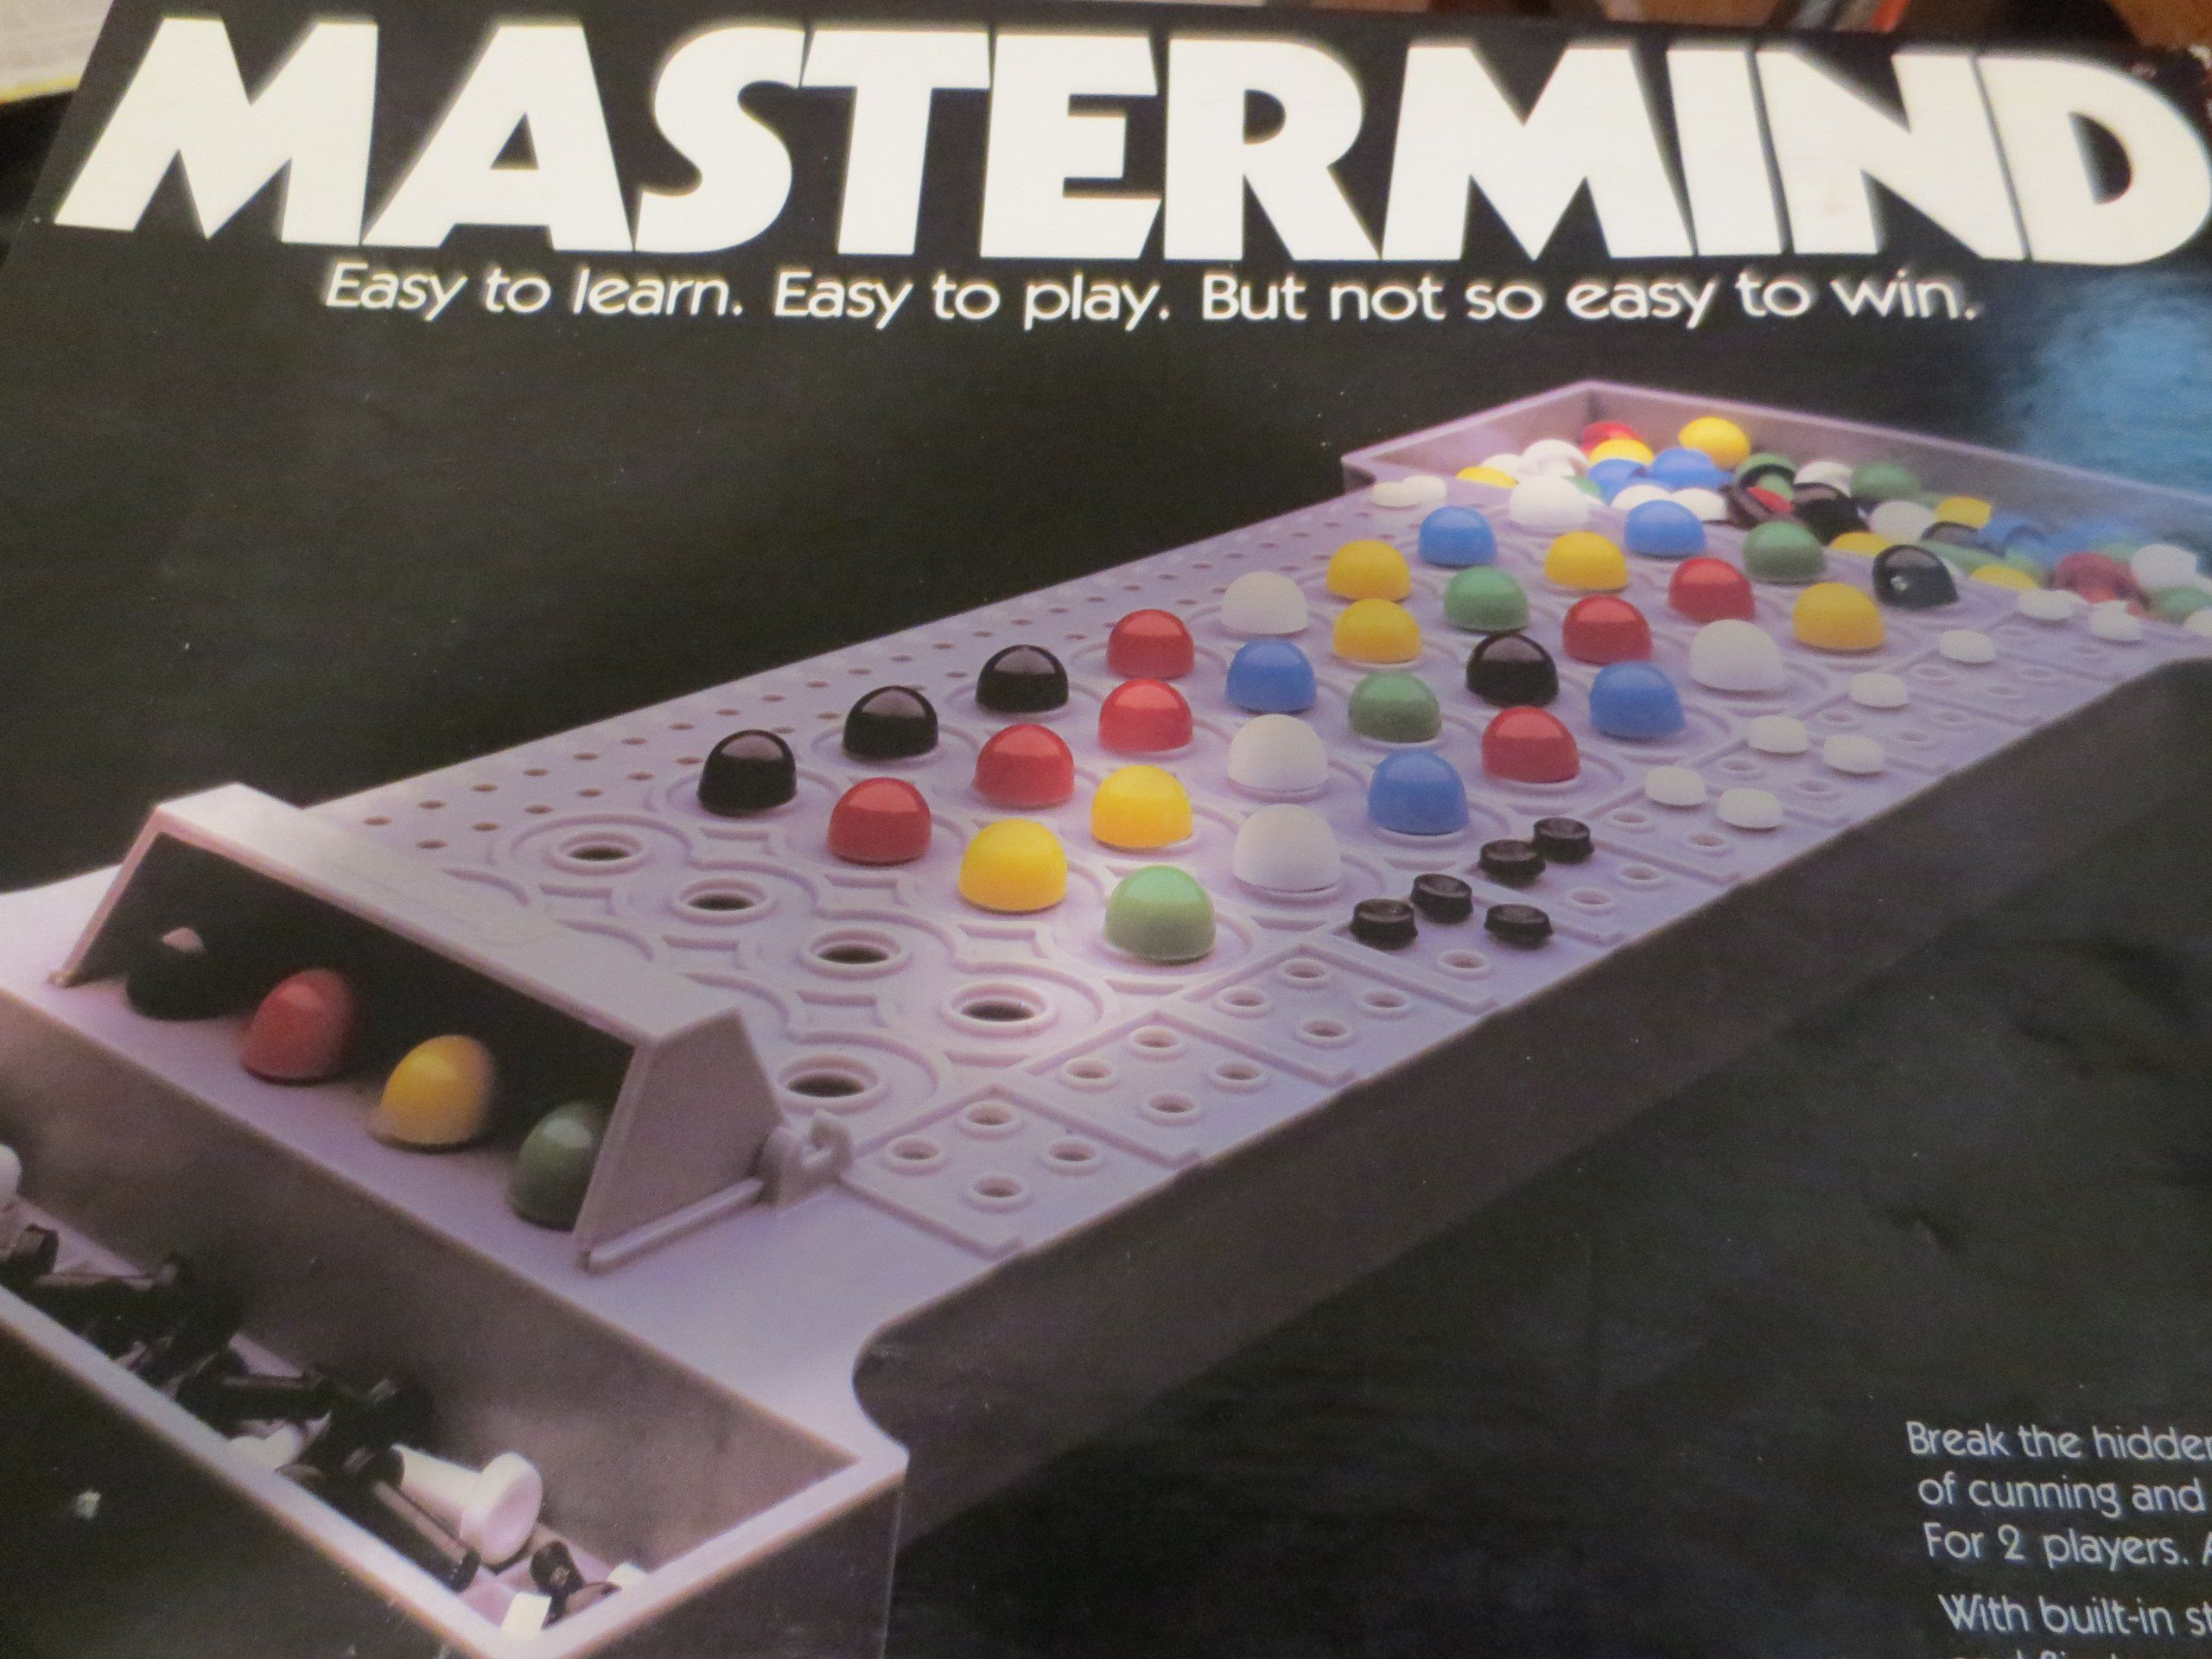 1981 Mastermind Break the Hidden Code in This Game of